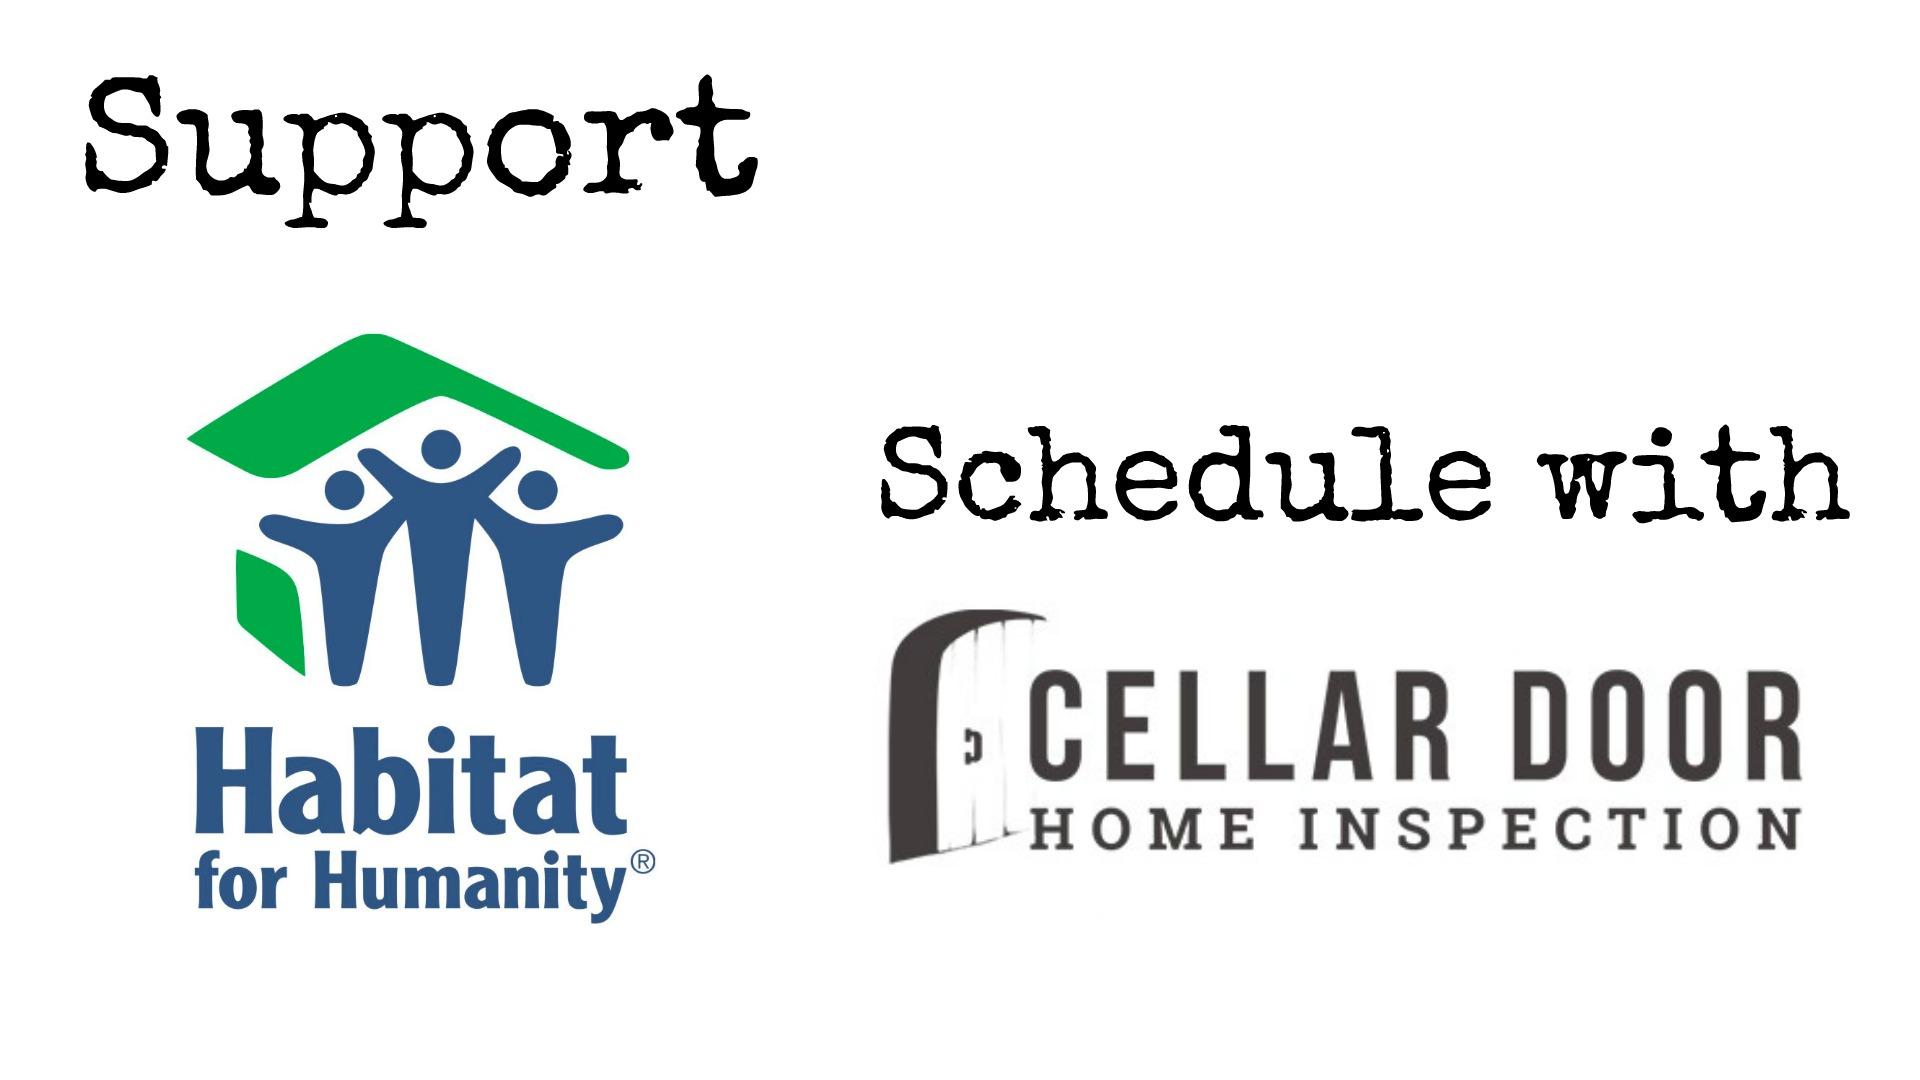 Cellar Door's Community Involvement: Habitat For Humanity